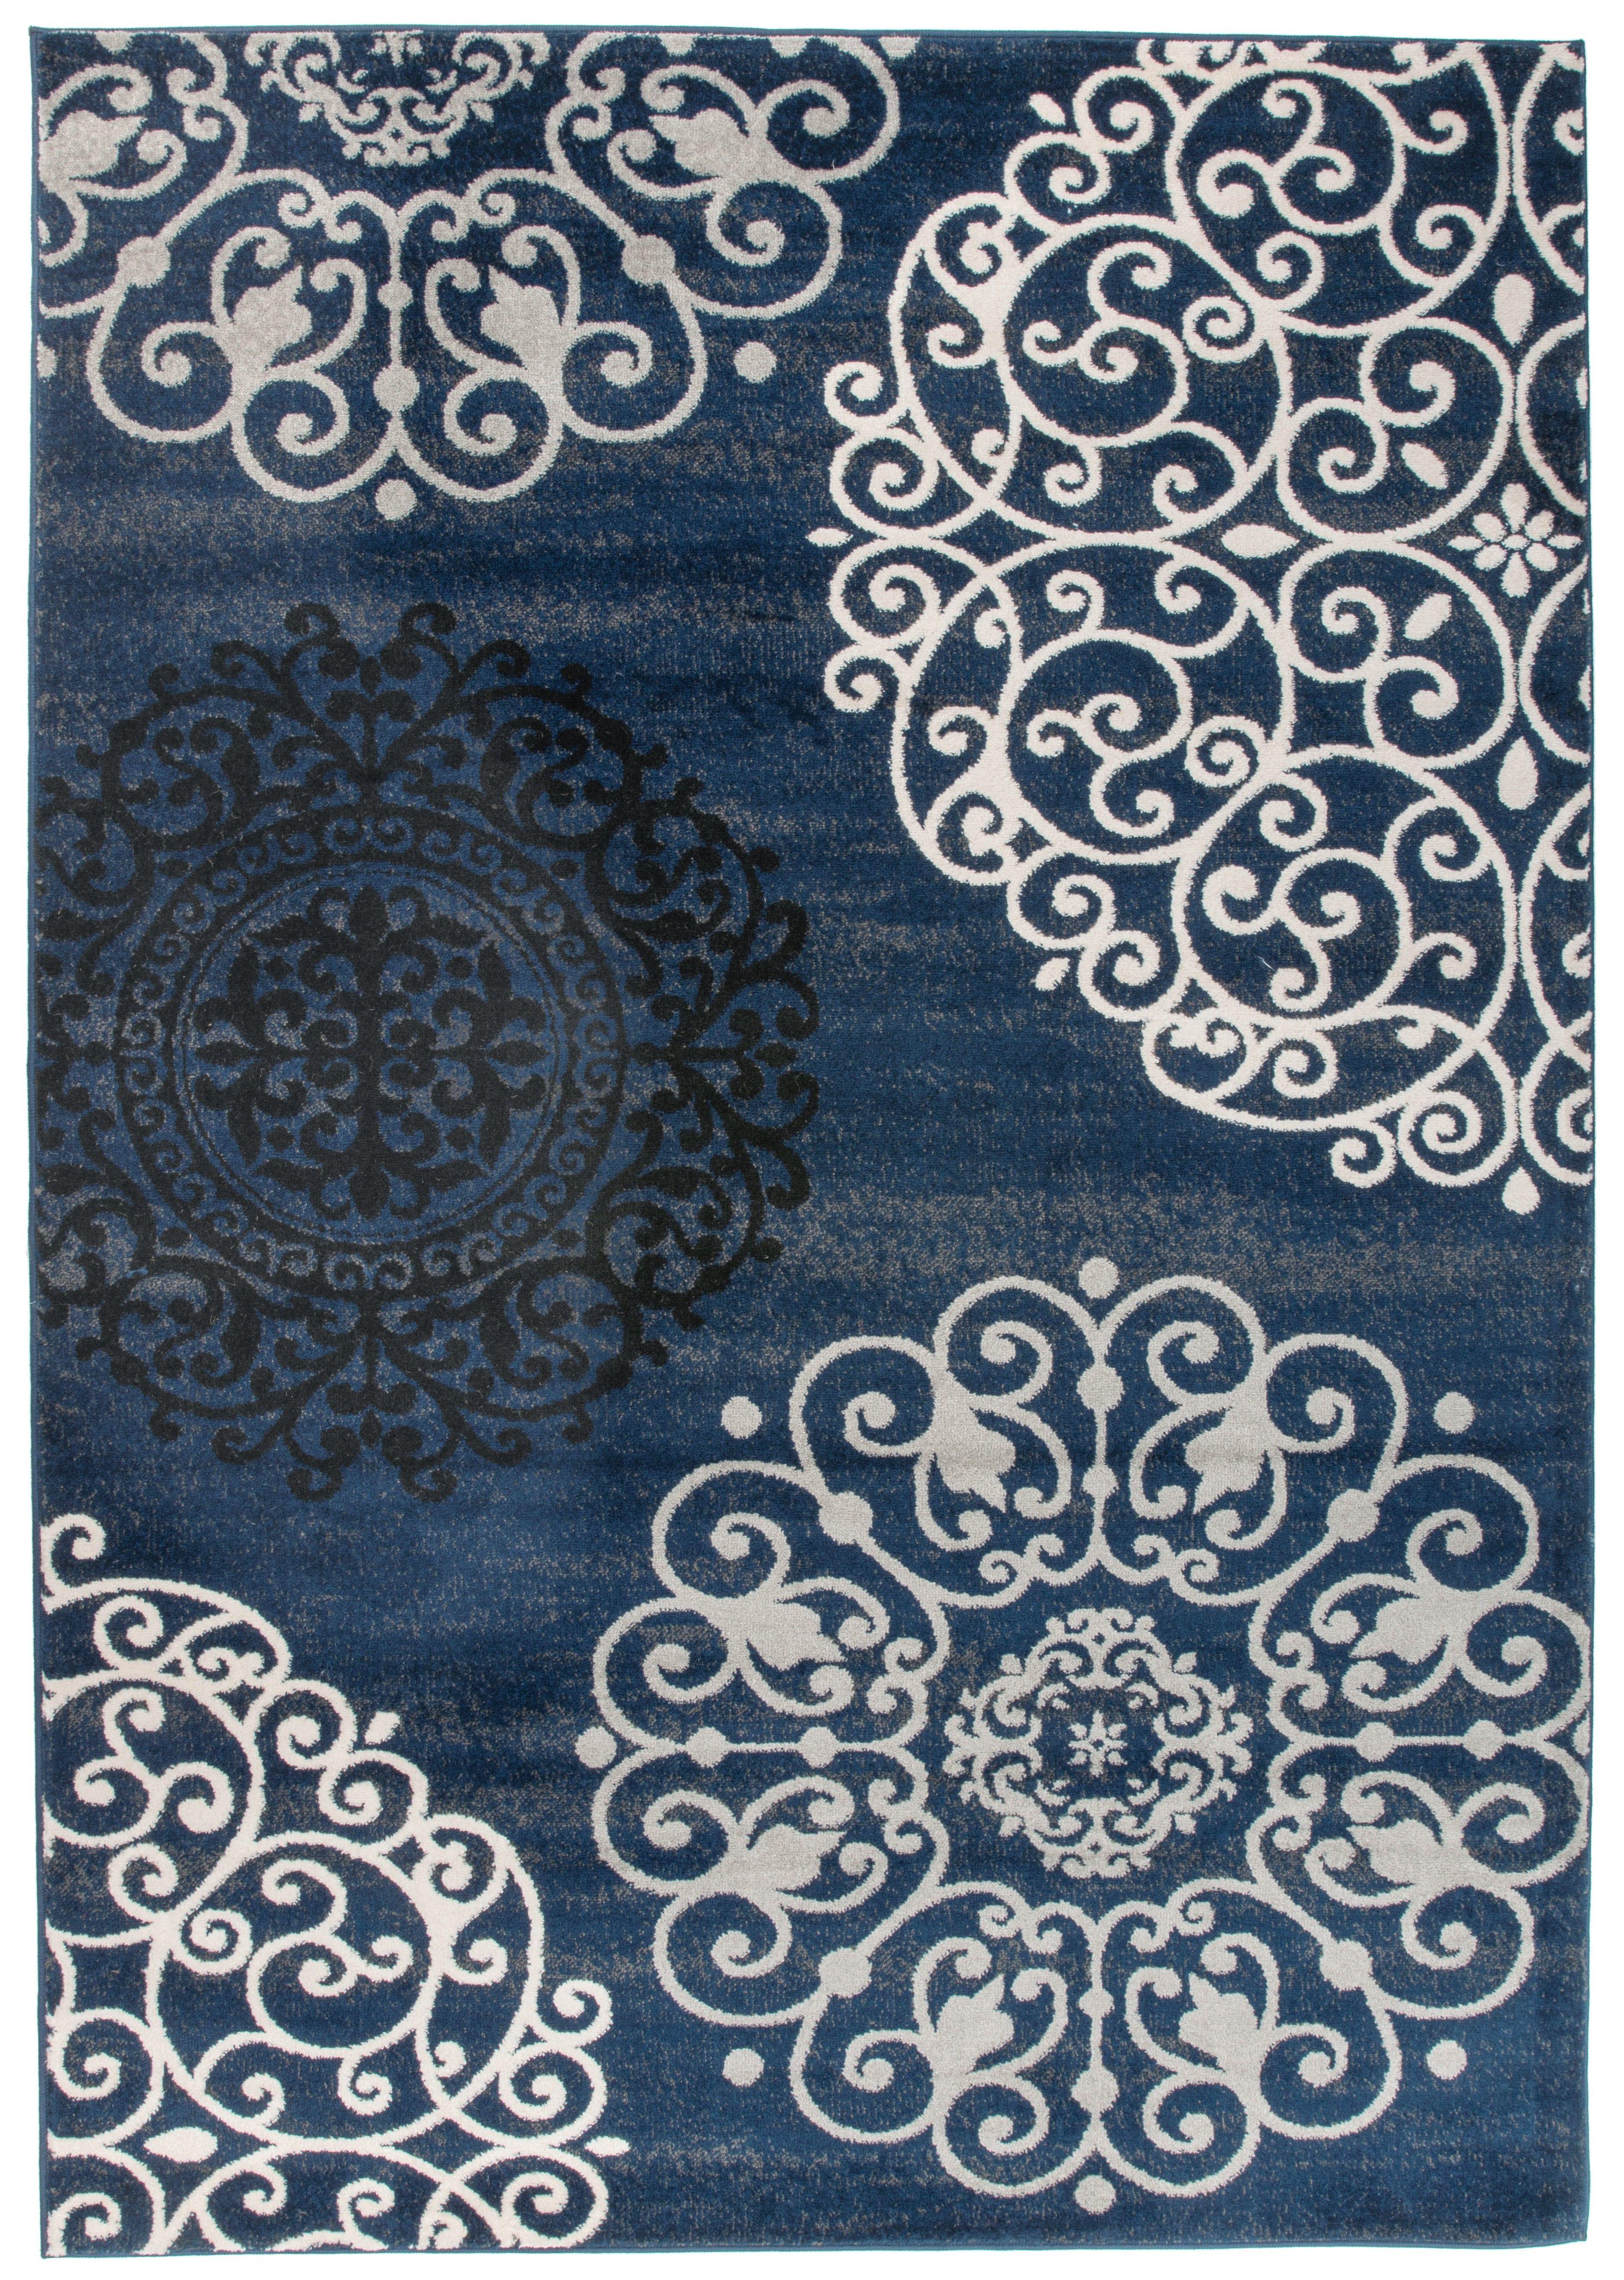 Ebern Designs Devonshire Floral Blue Area Rug Reviews Wayfair